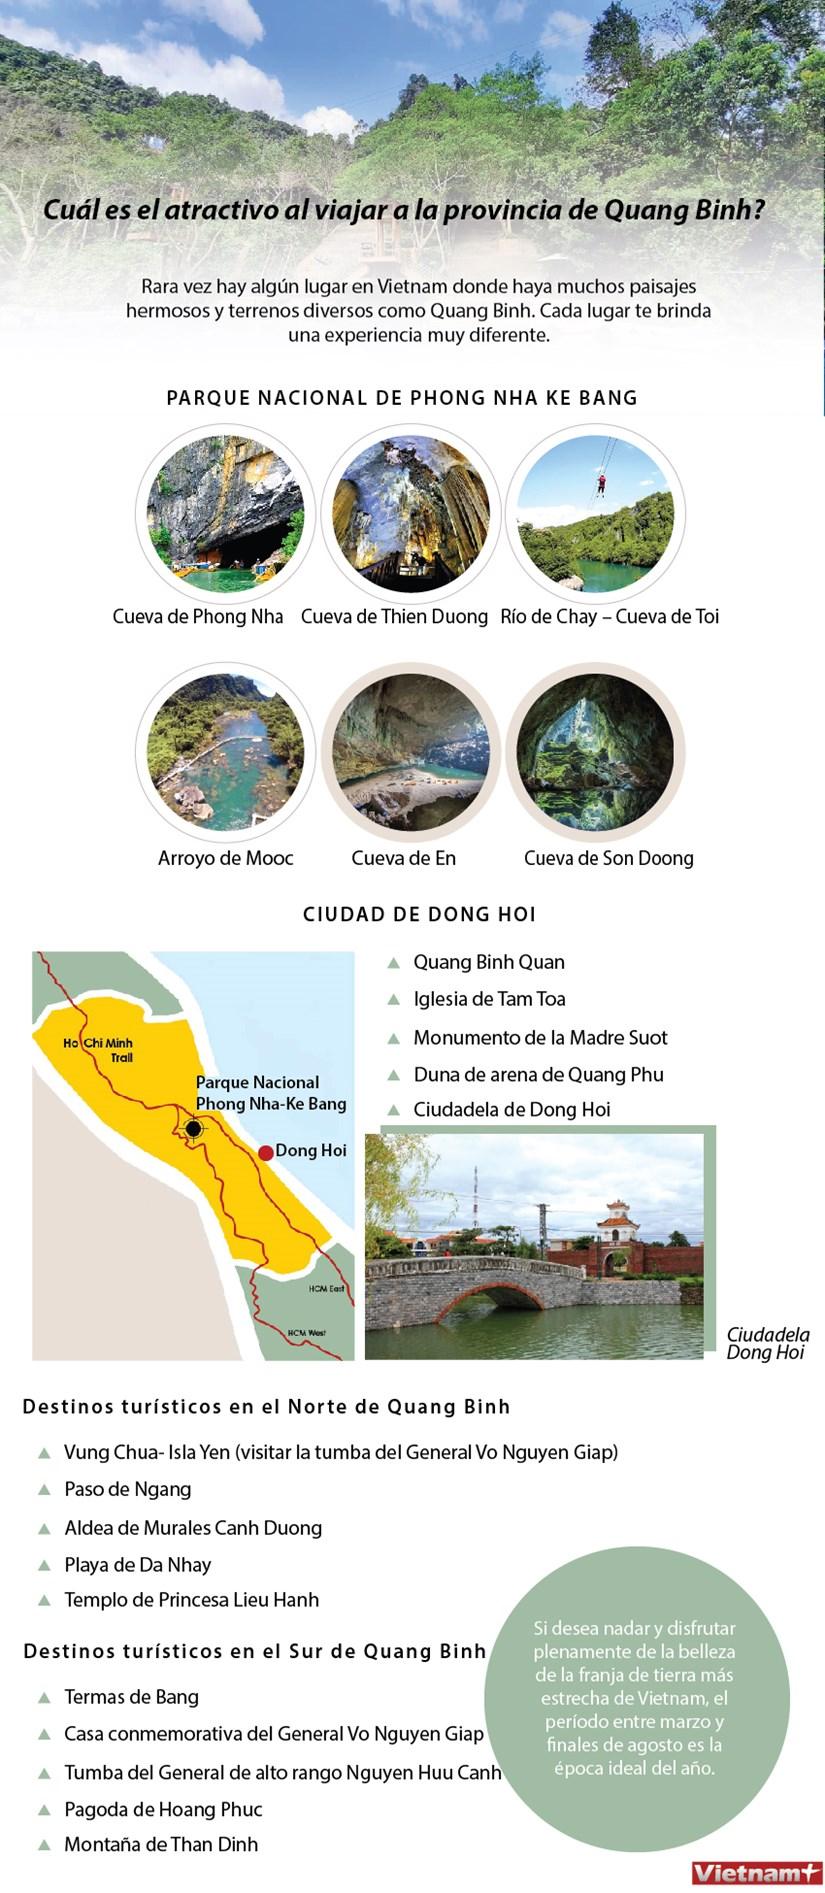 Destinos turisticos atractivos en provincia central de Quang Binh hinh anh 1